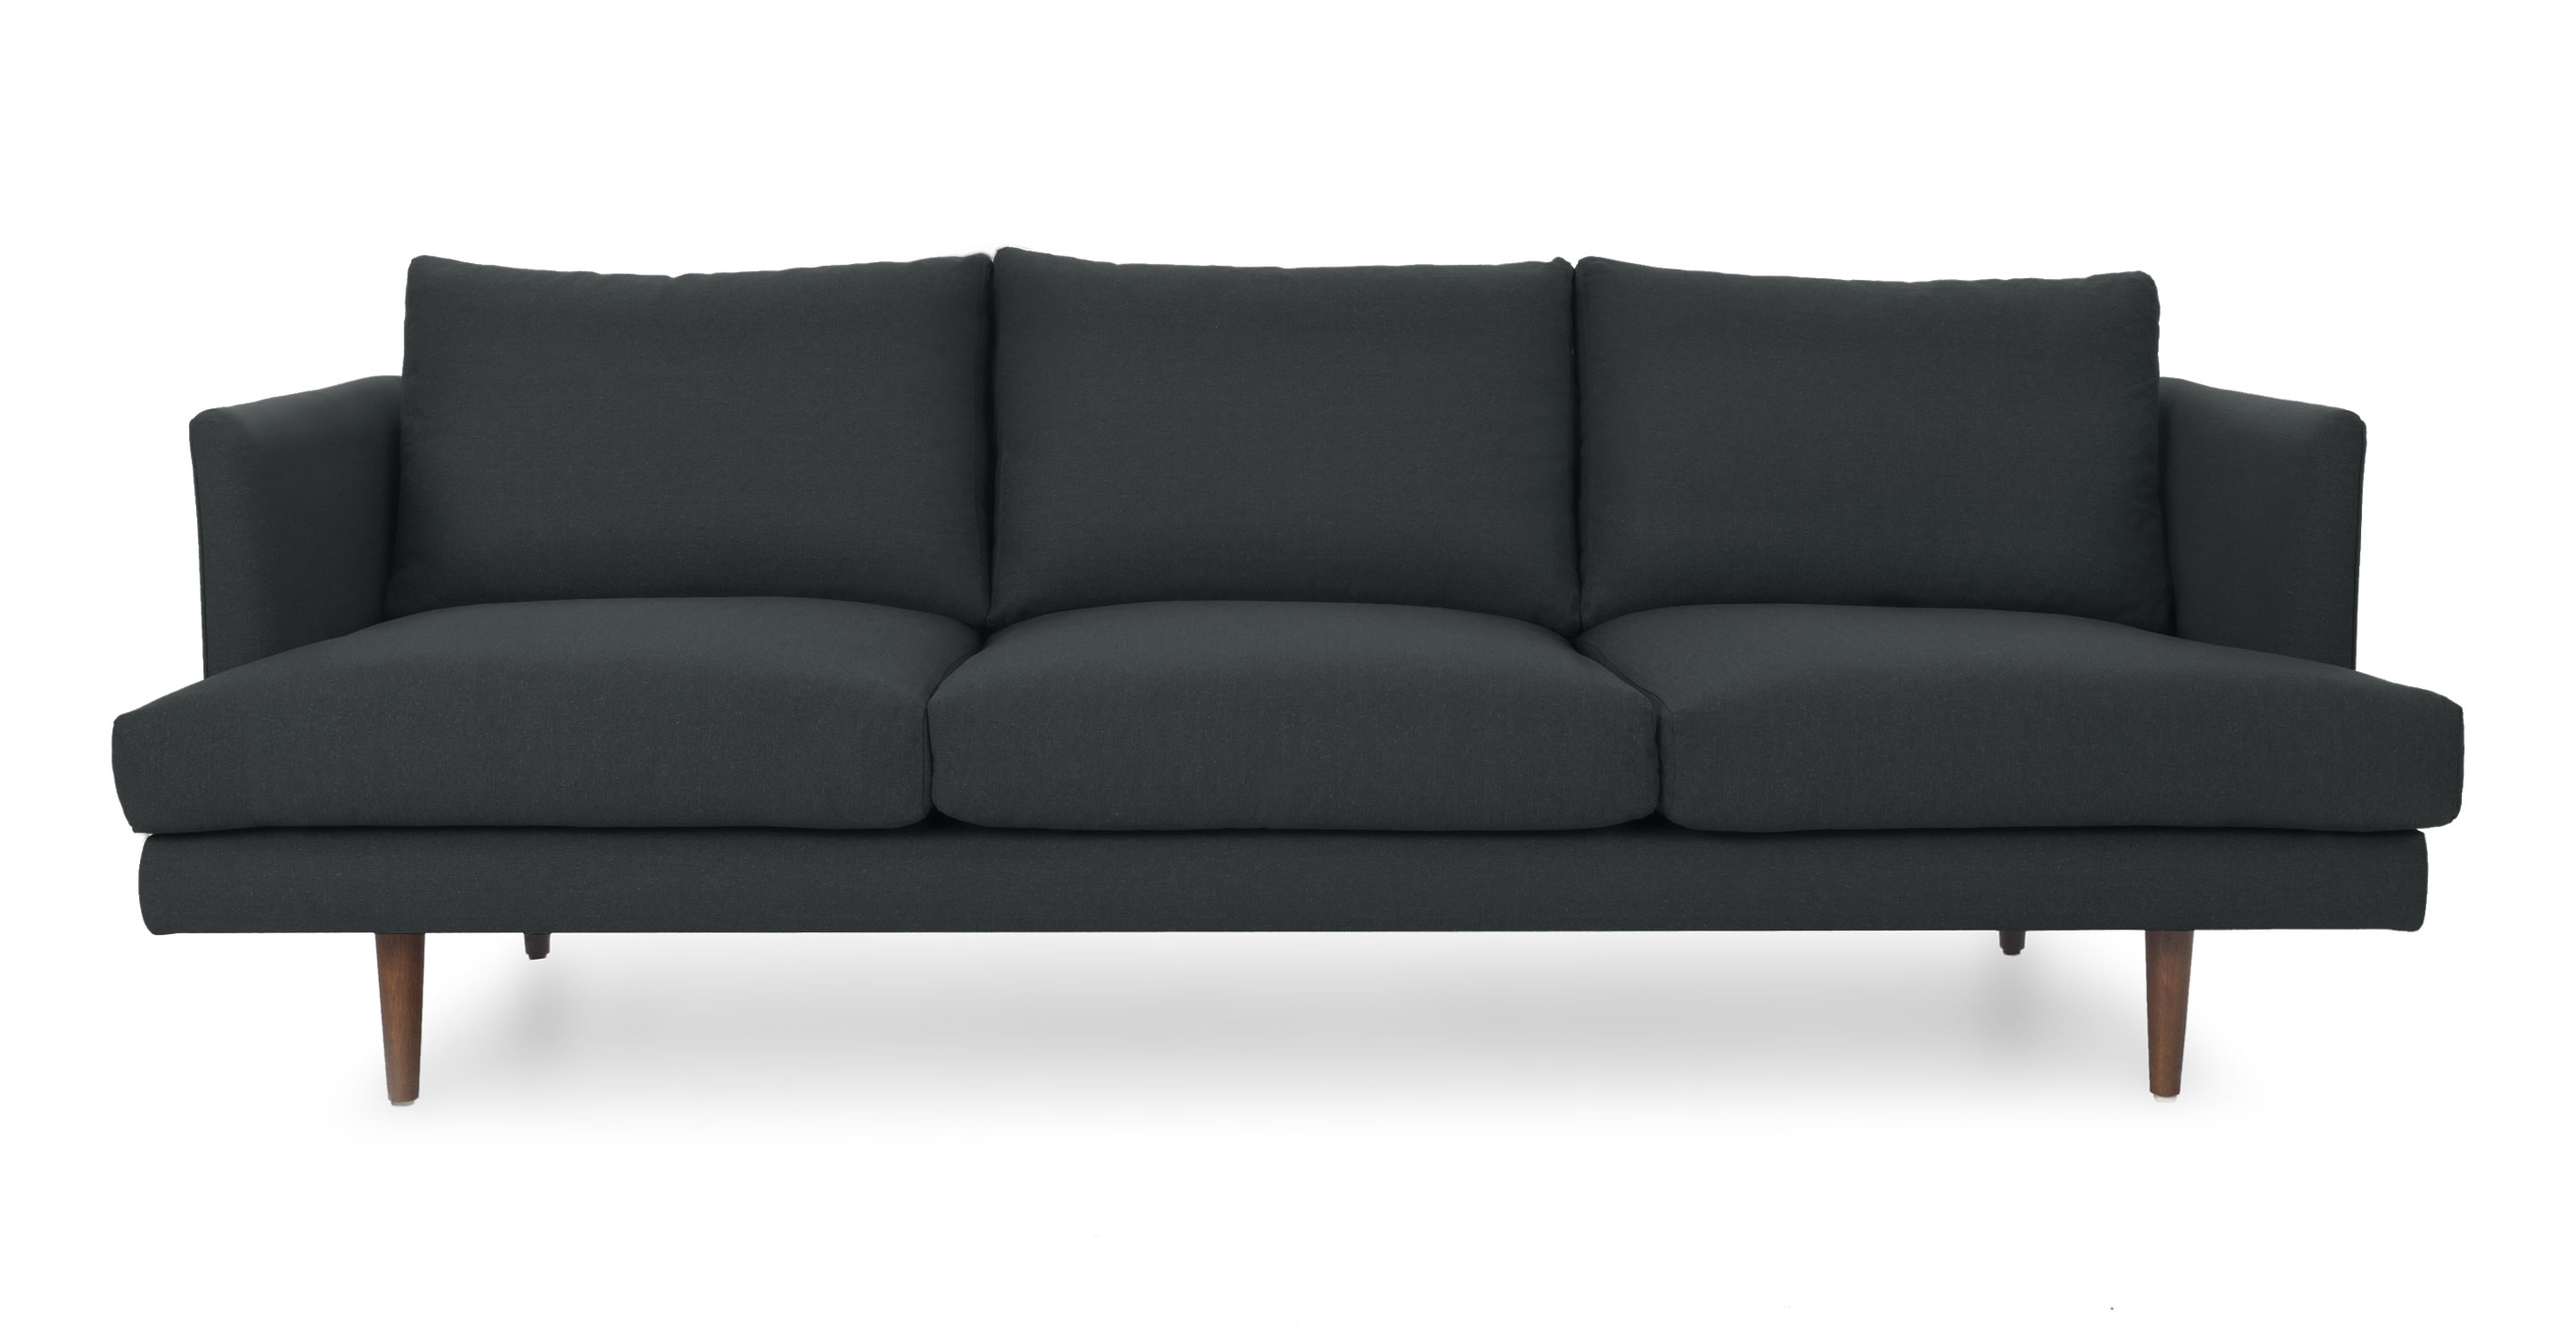 mid century style sofa canada leather world birmingham reviews carl basalt gray sofas article modern